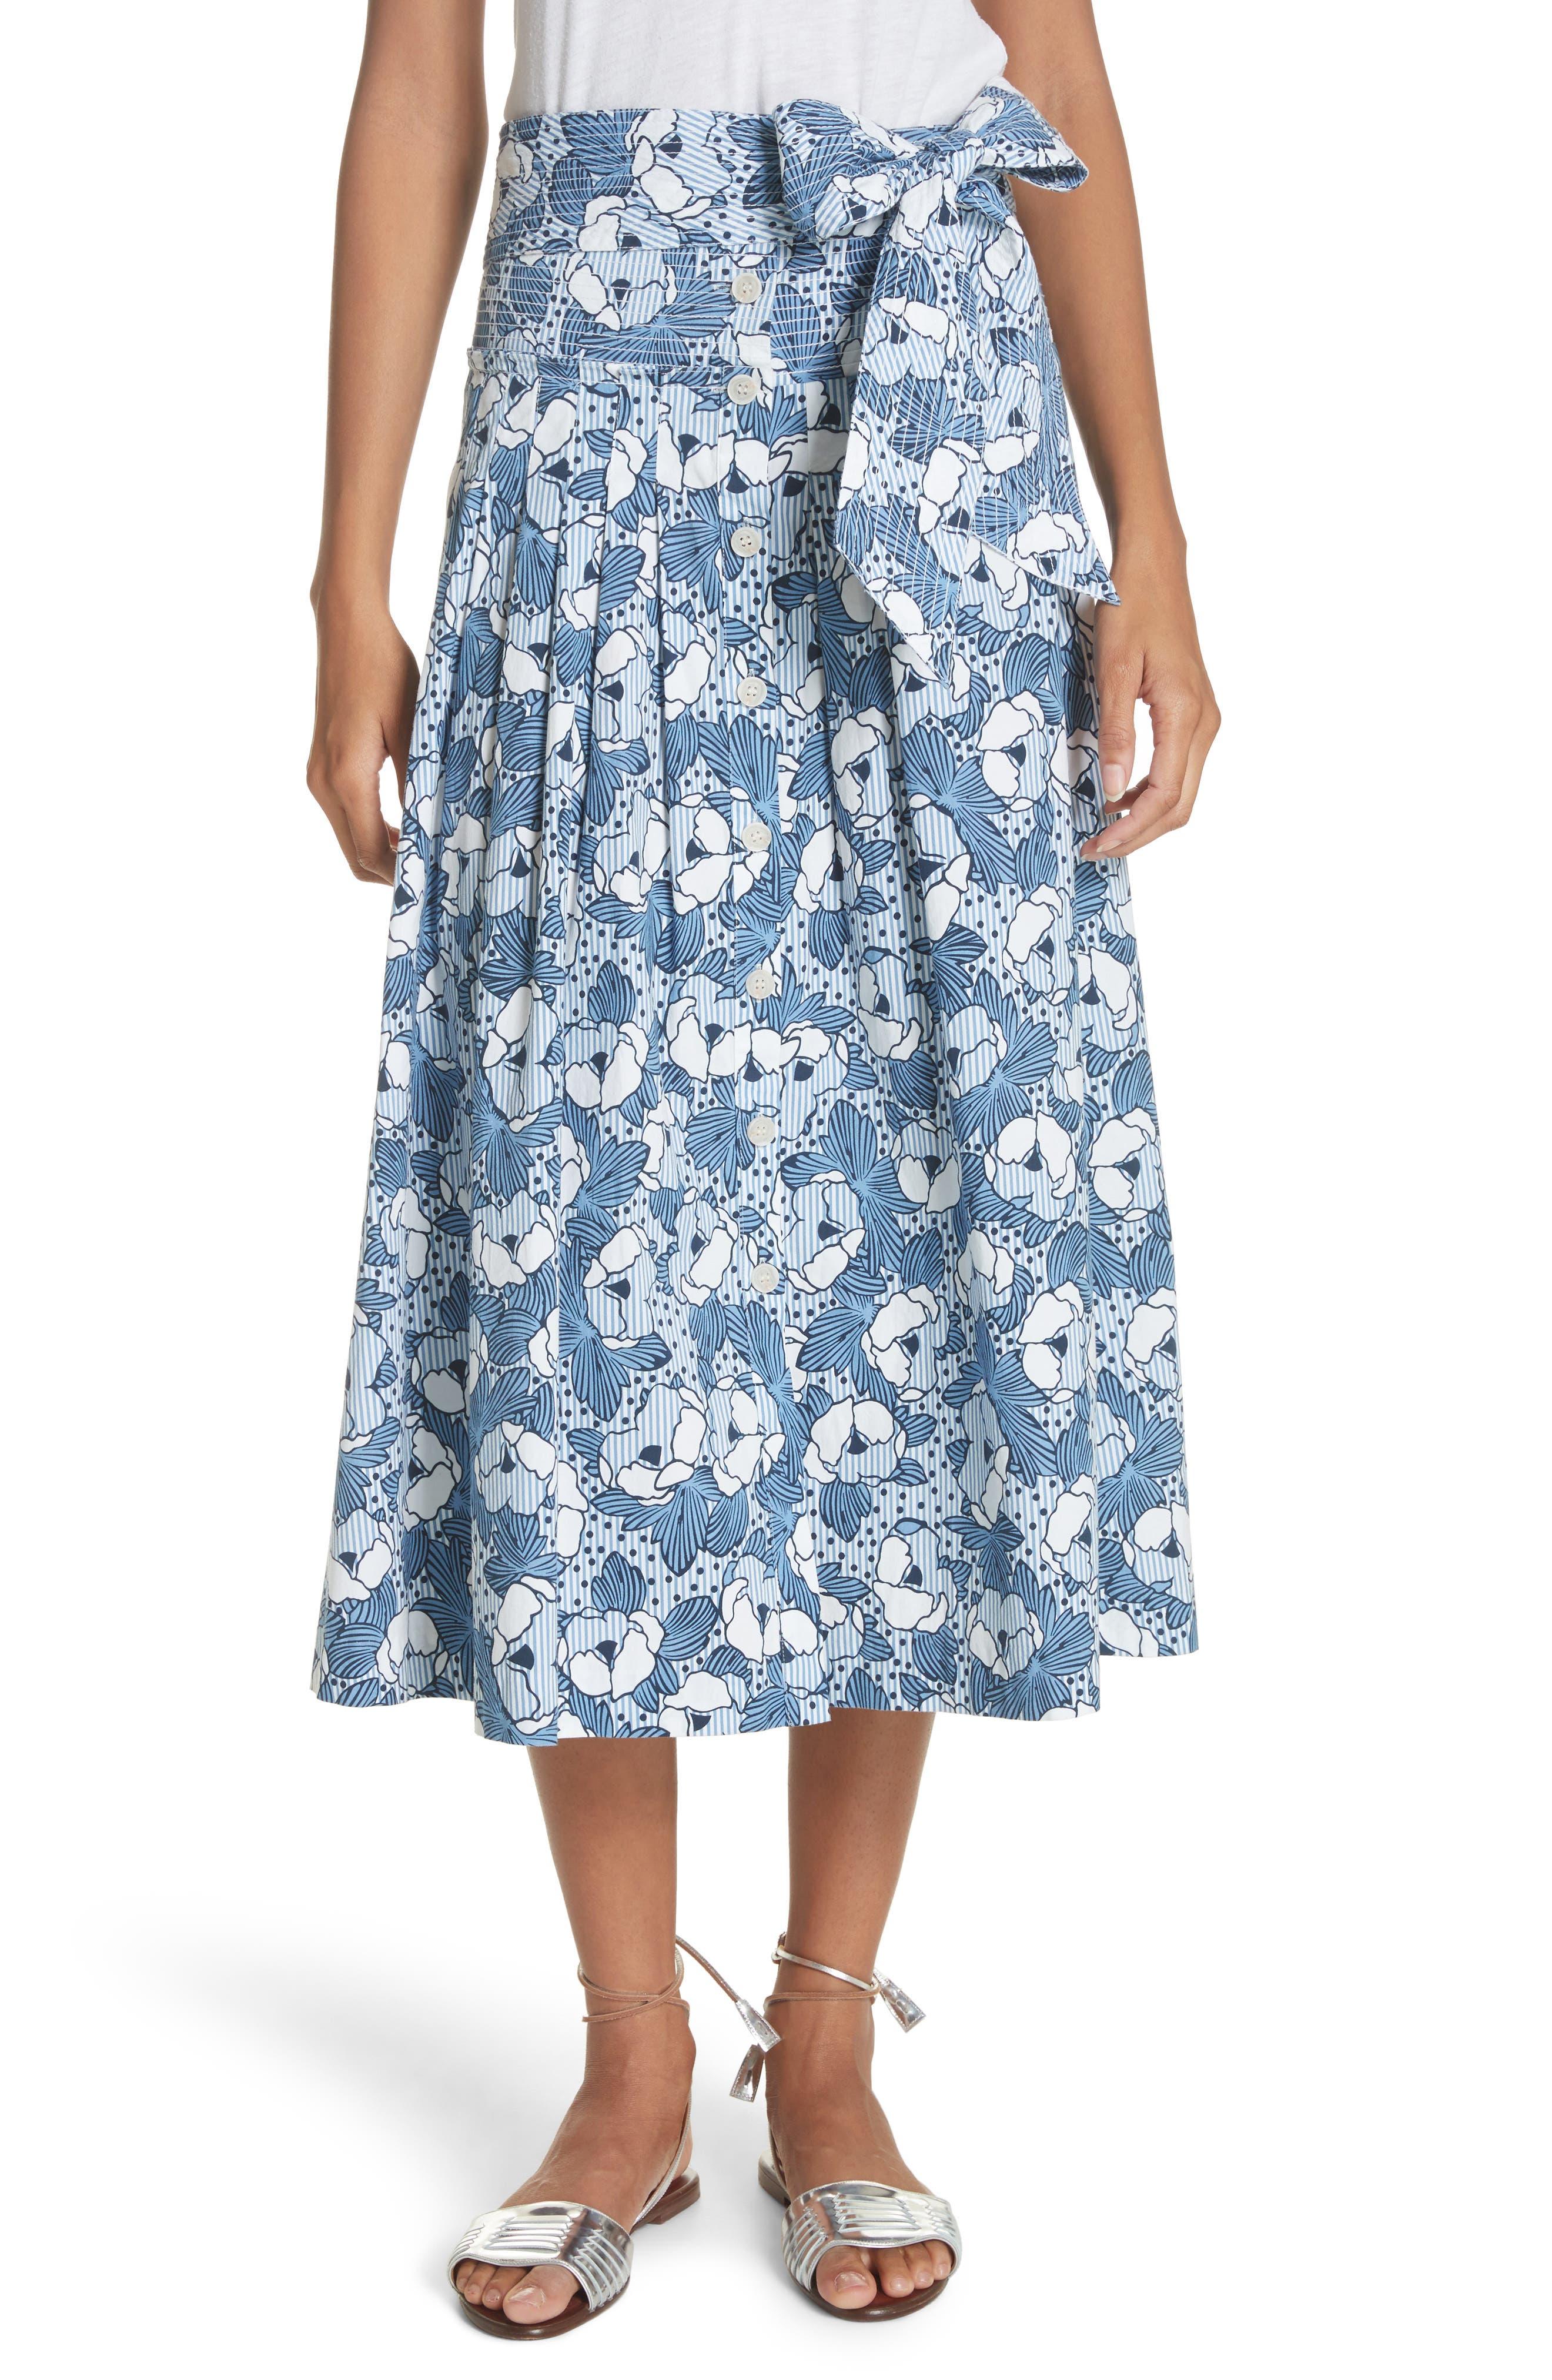 Caralina Floral Print Midi Skirt,                             Main thumbnail 1, color,                             Blue/ White